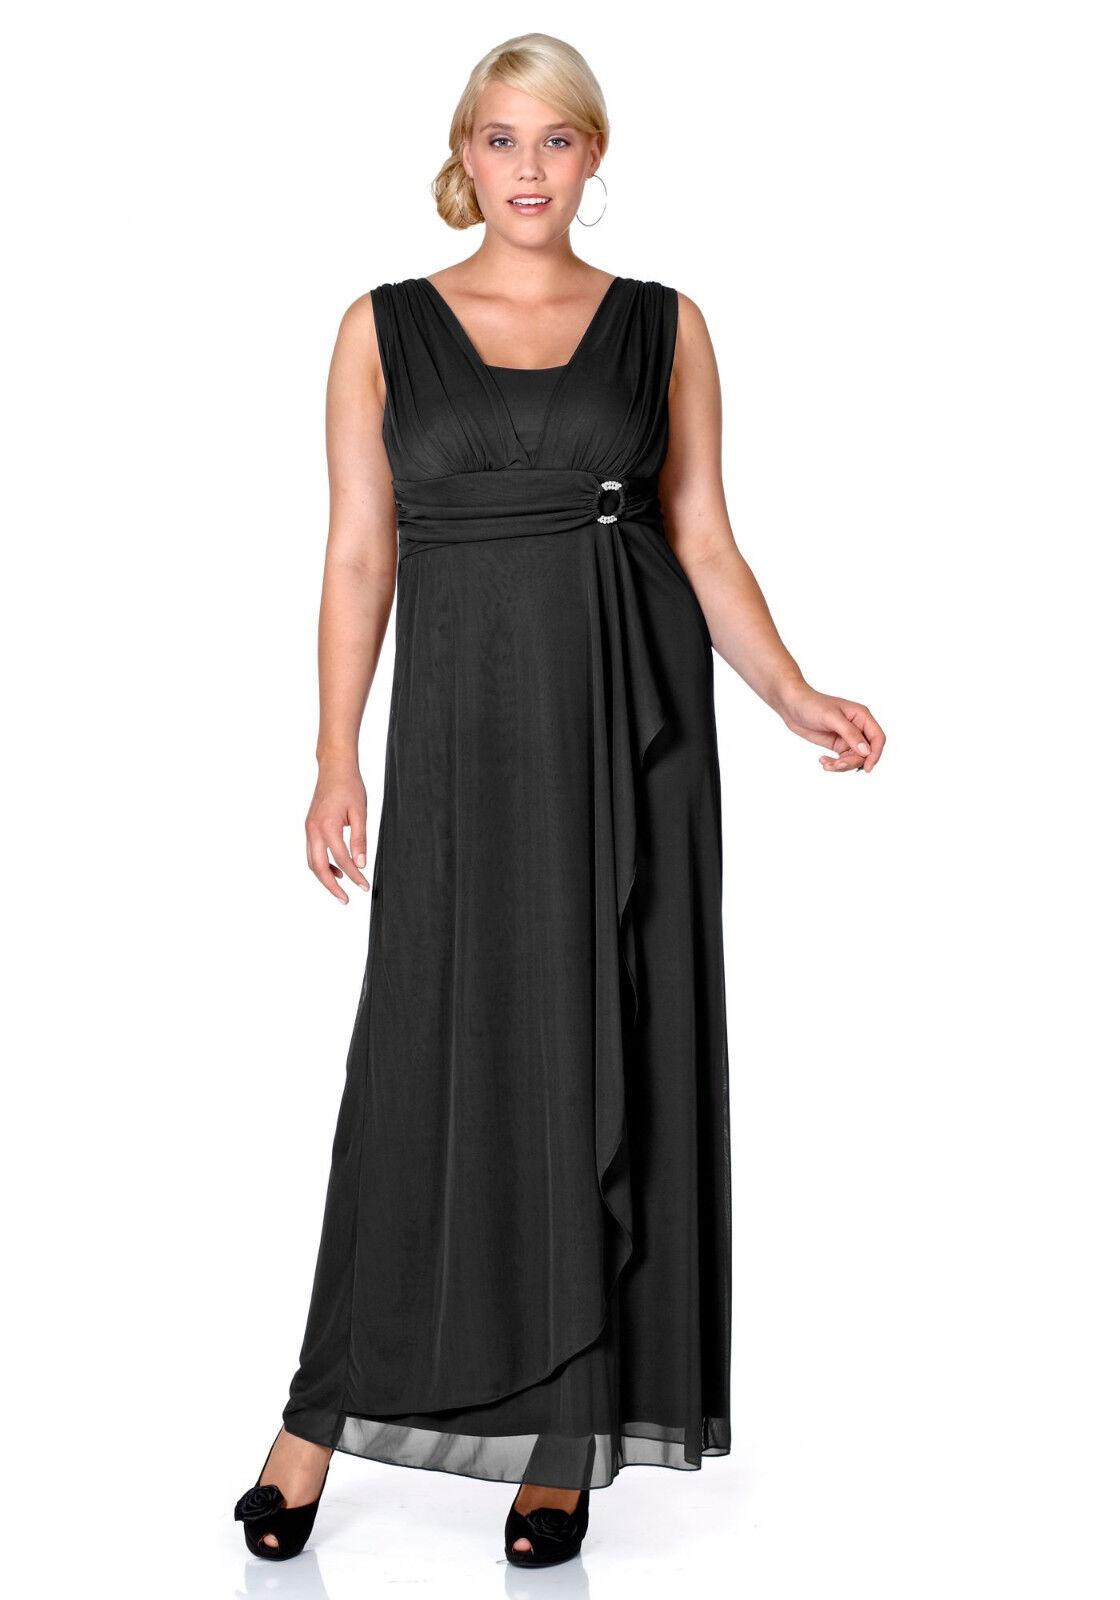 Details zu Abend-Kleid sheego Style. Schwarz. Kurz-Gr. NEU!!! KP 11,11 €  SALE%%%